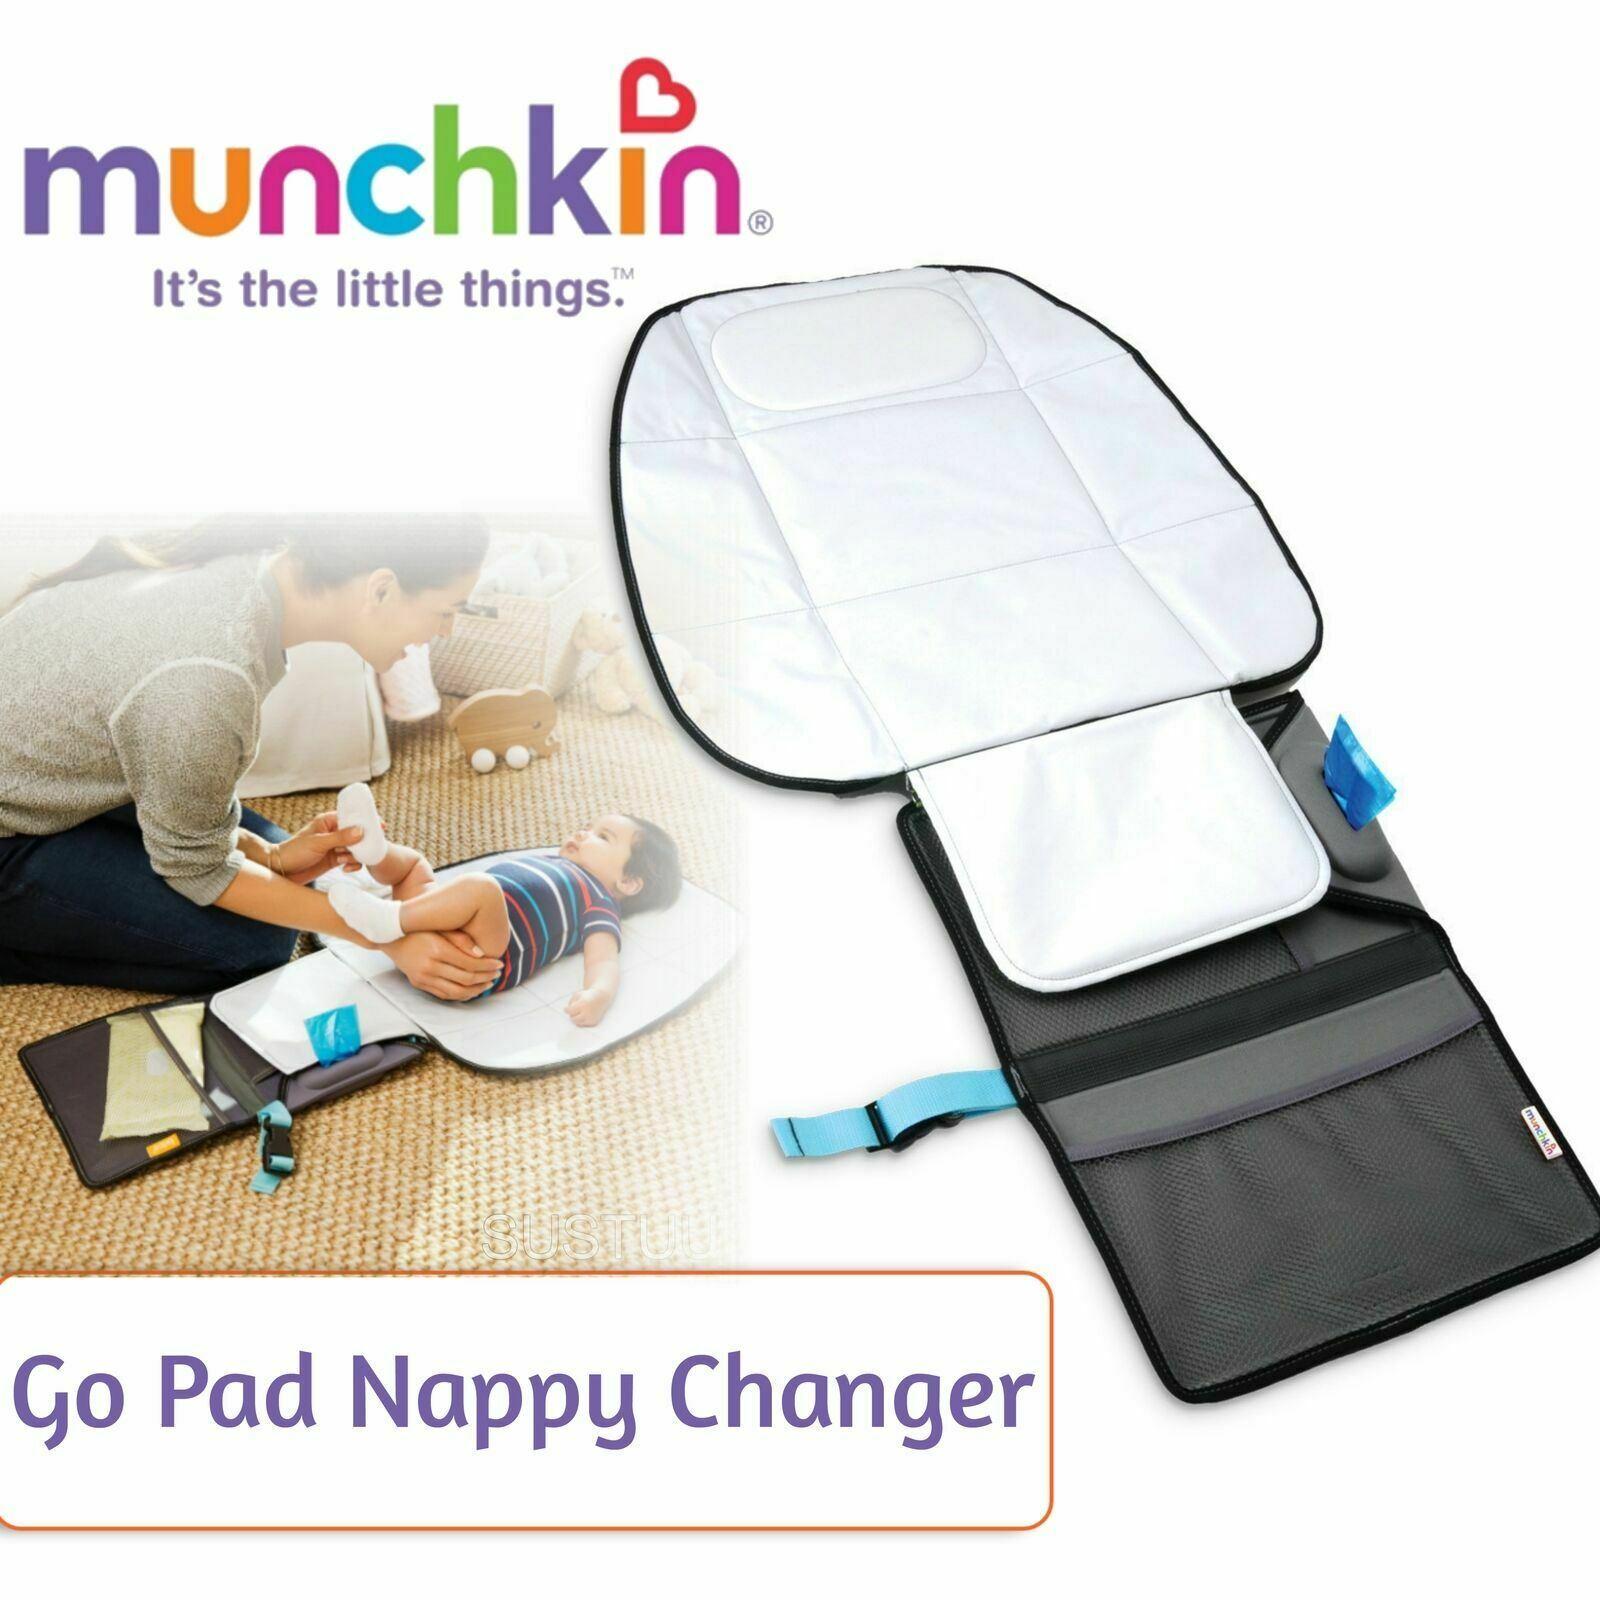 NEW MUNCHKIN BABY TODDLER GO PAD NAPPY CHANGER ORGANISER